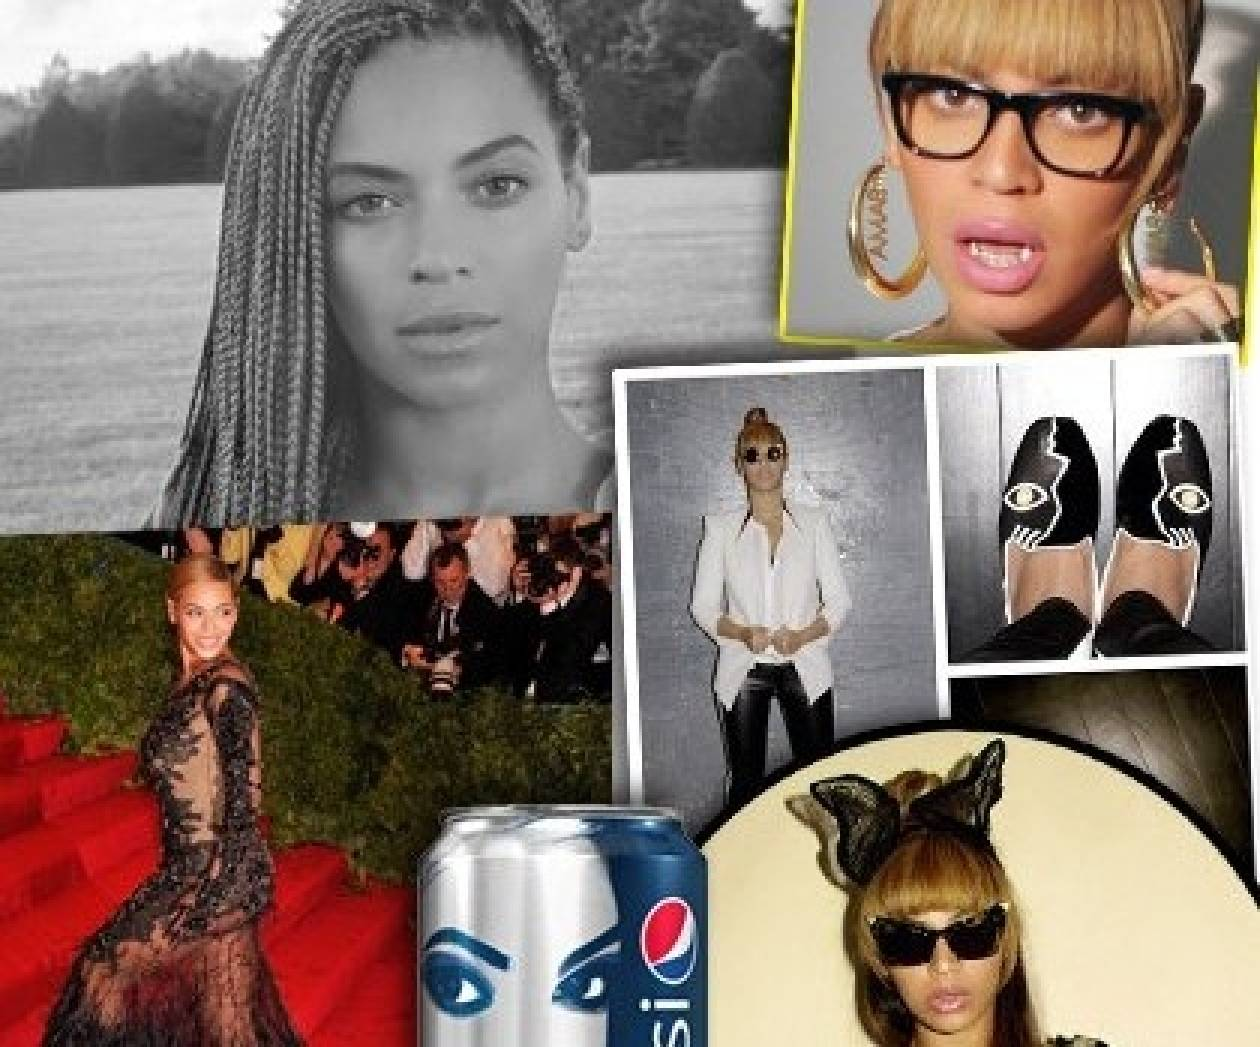 Beyonce: όλες οι τάσεις που καθιέρωσε το αγαπημένο μας pop idol